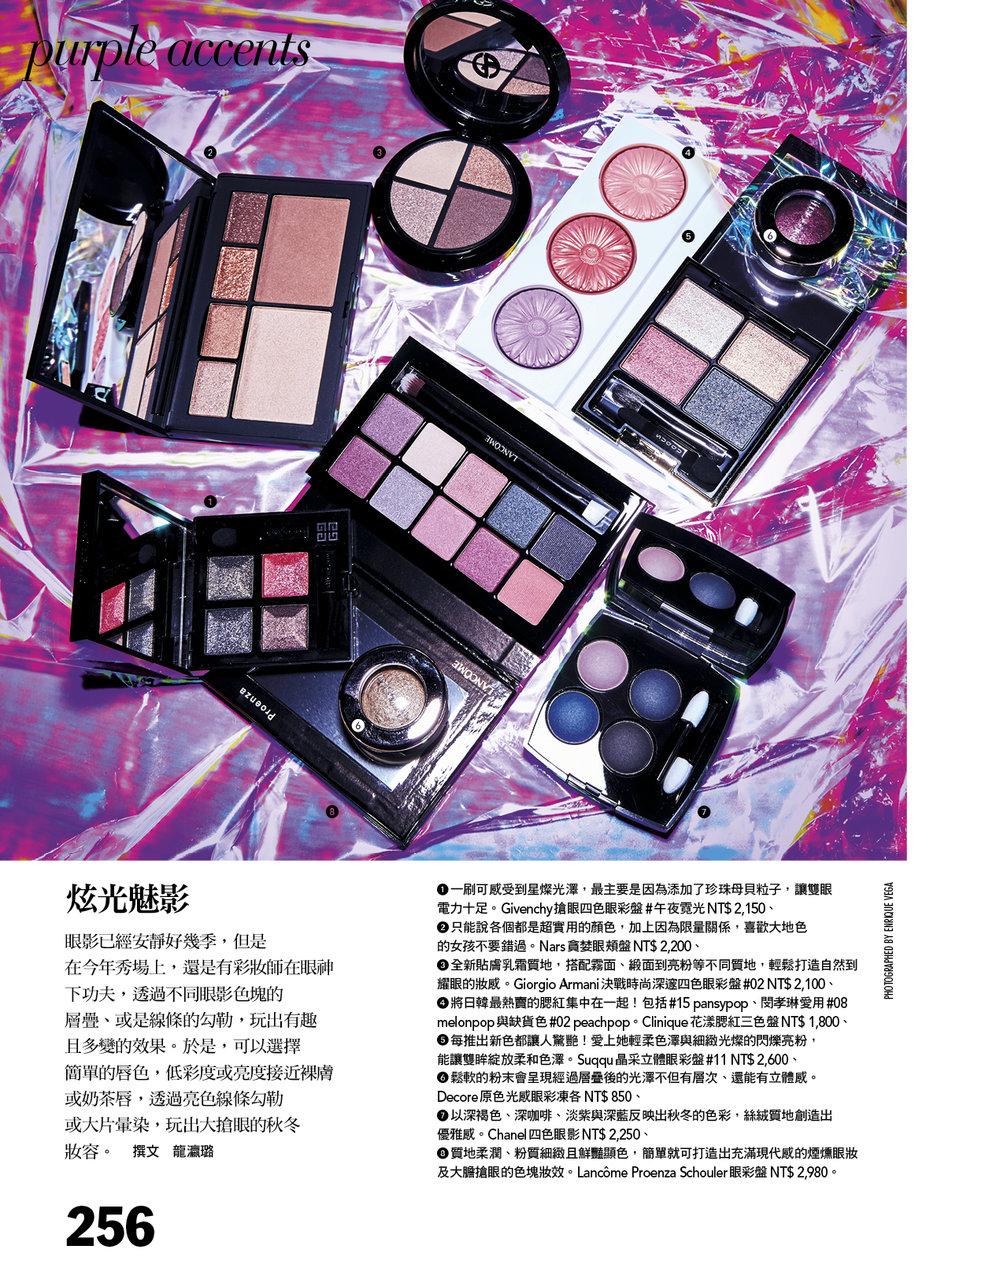 Blanca Padilla for VOGUE Taiwan by Enrique Vega [Layout]7.jpg